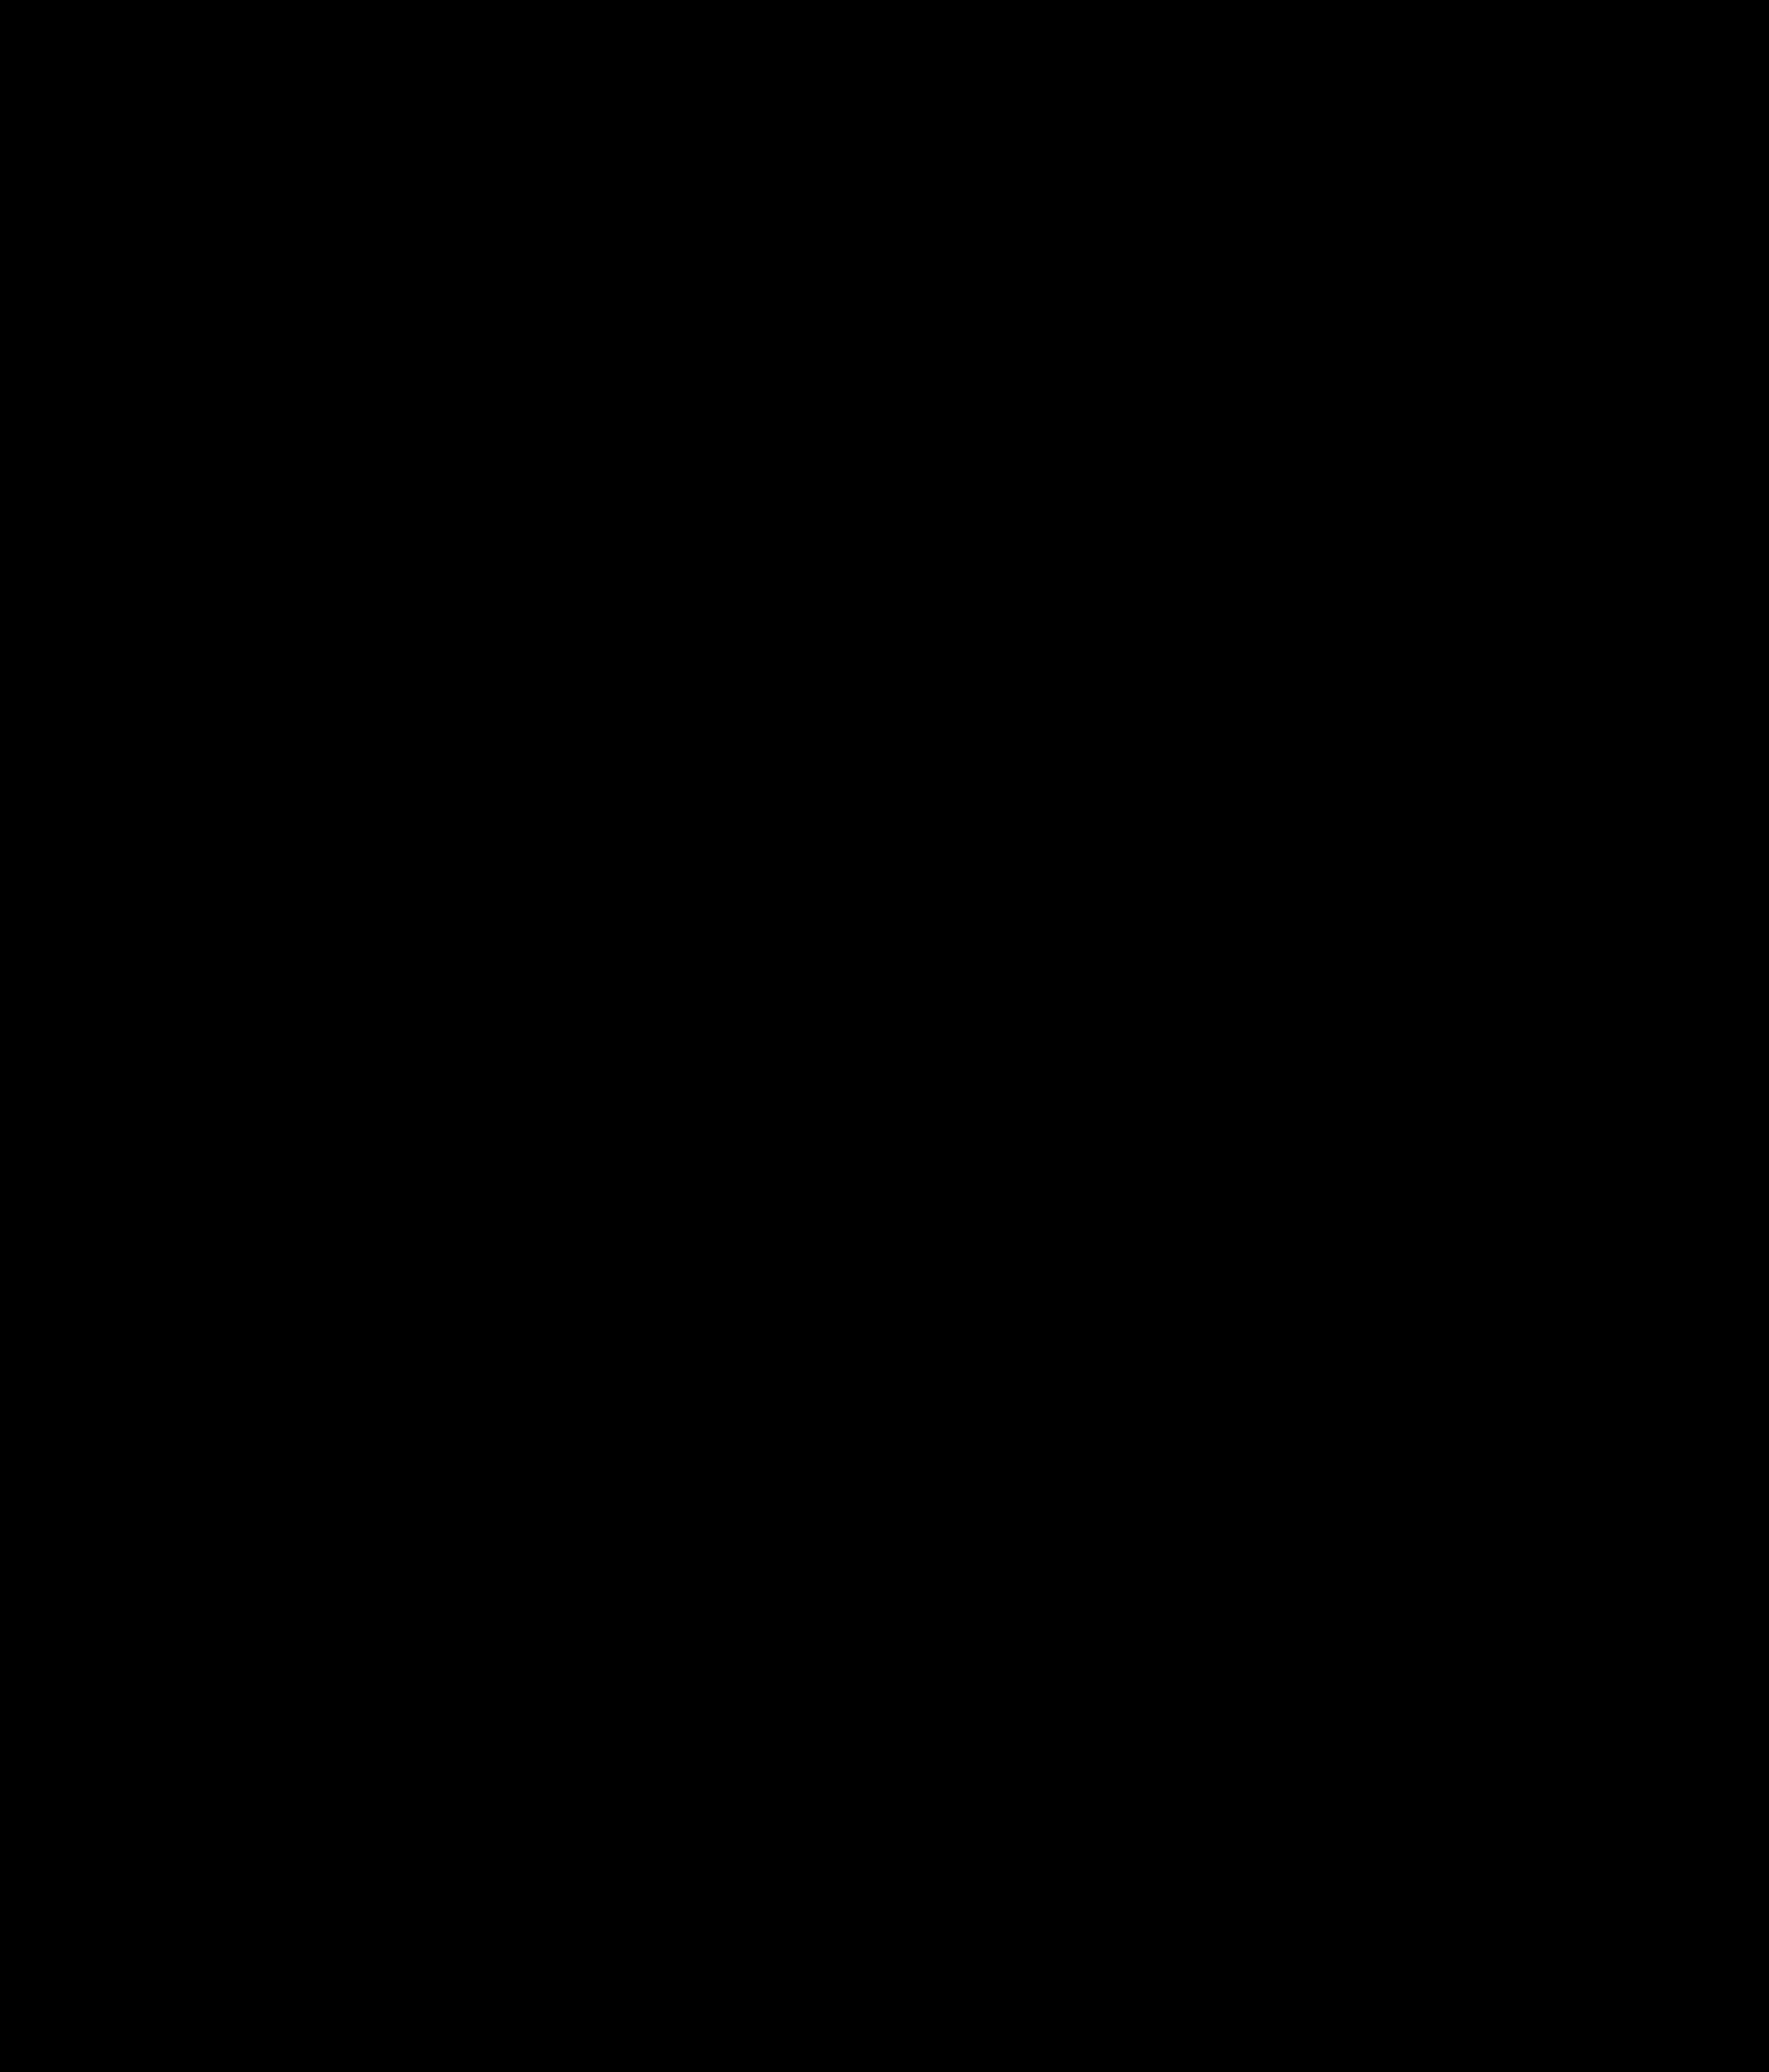 led circuit diagram symbol clipart best